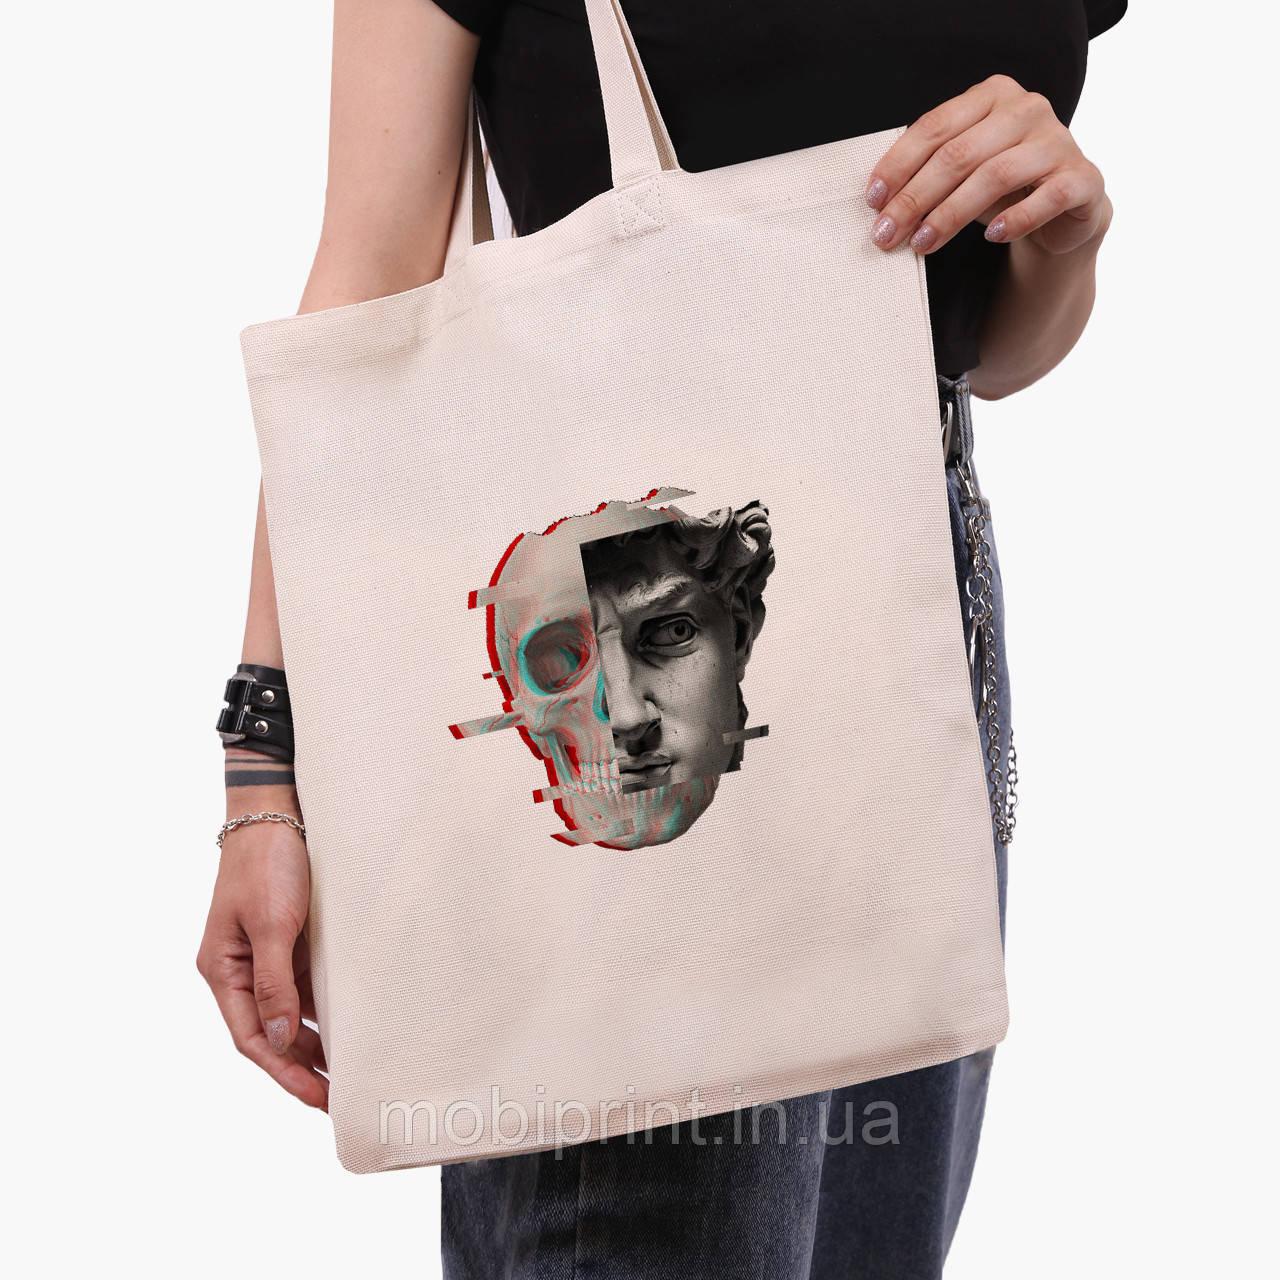 Эко сумка шоппер Ренессанс-Давид (David Renaissance) (9227-1585)  экосумка шопер 41*35 см